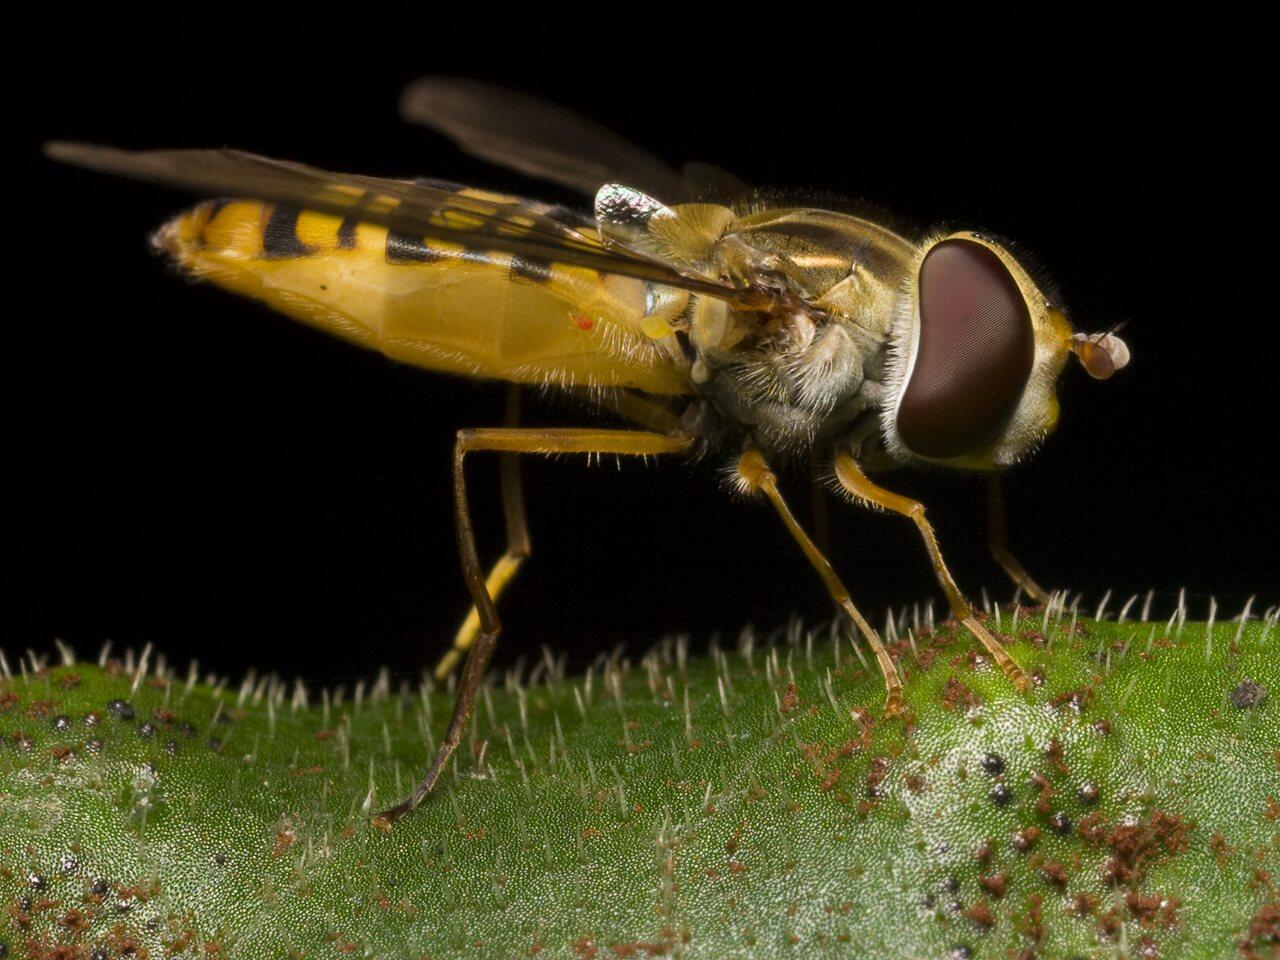 Episyrphus-balteatus-1292.jpg